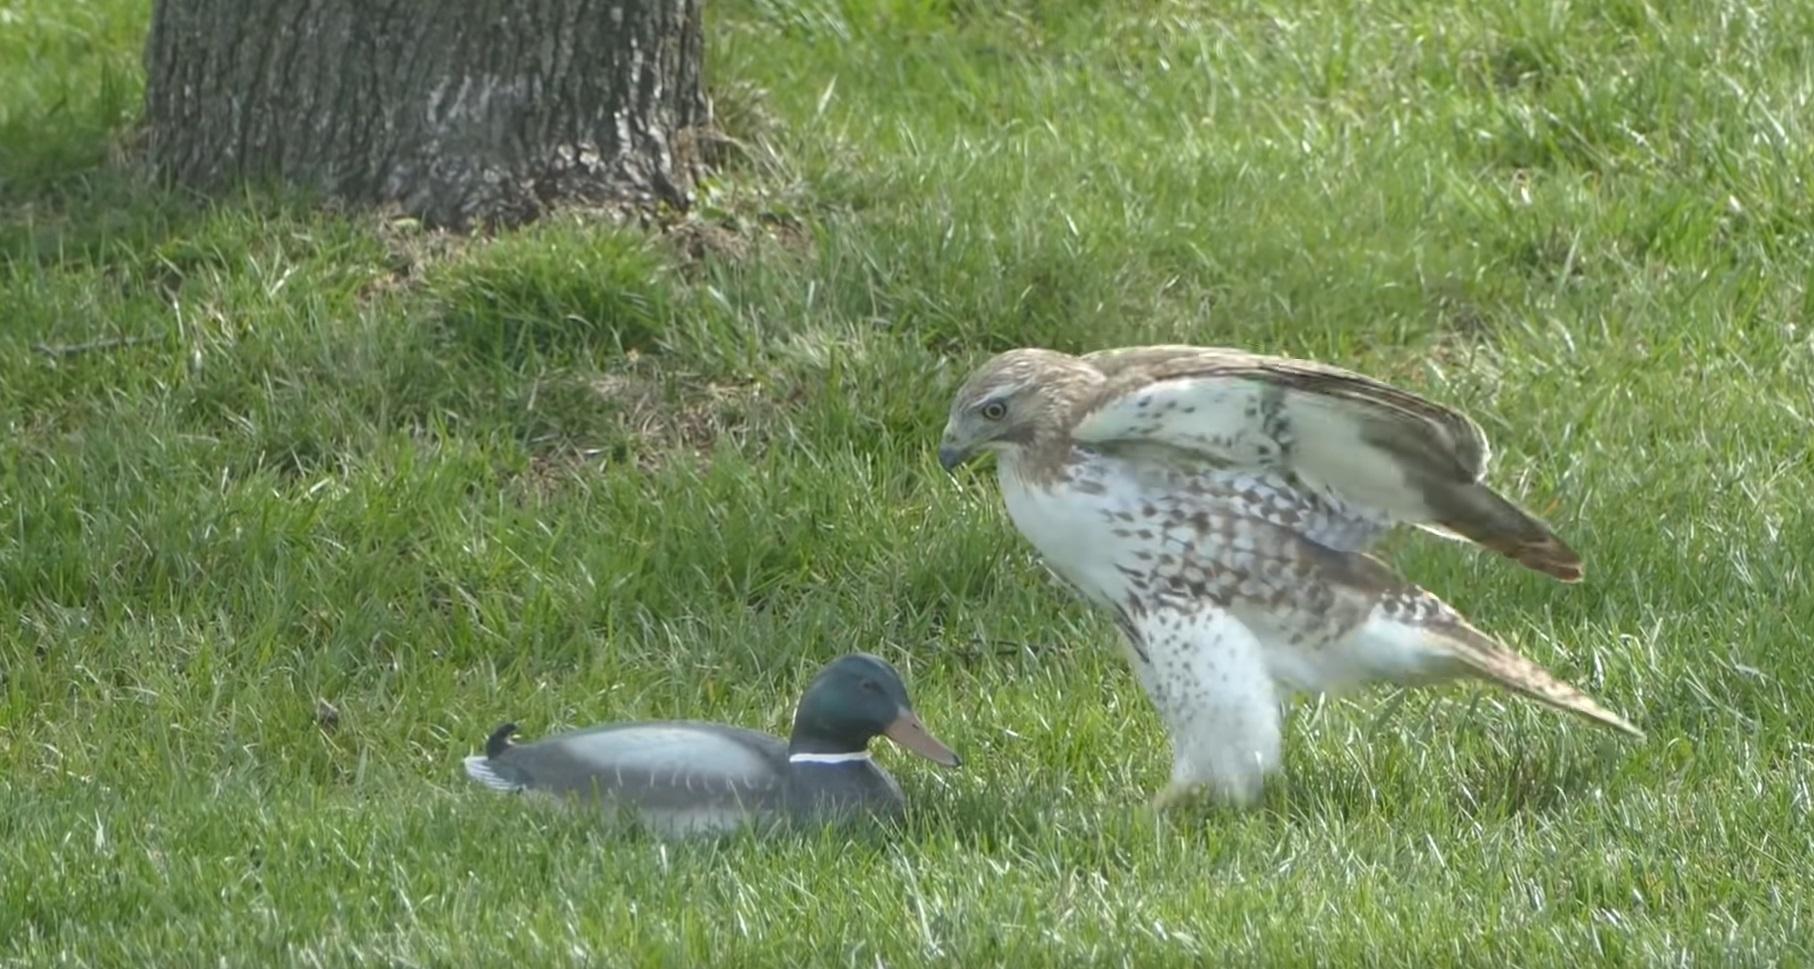 Hawk Perplexed Over Fake Duck